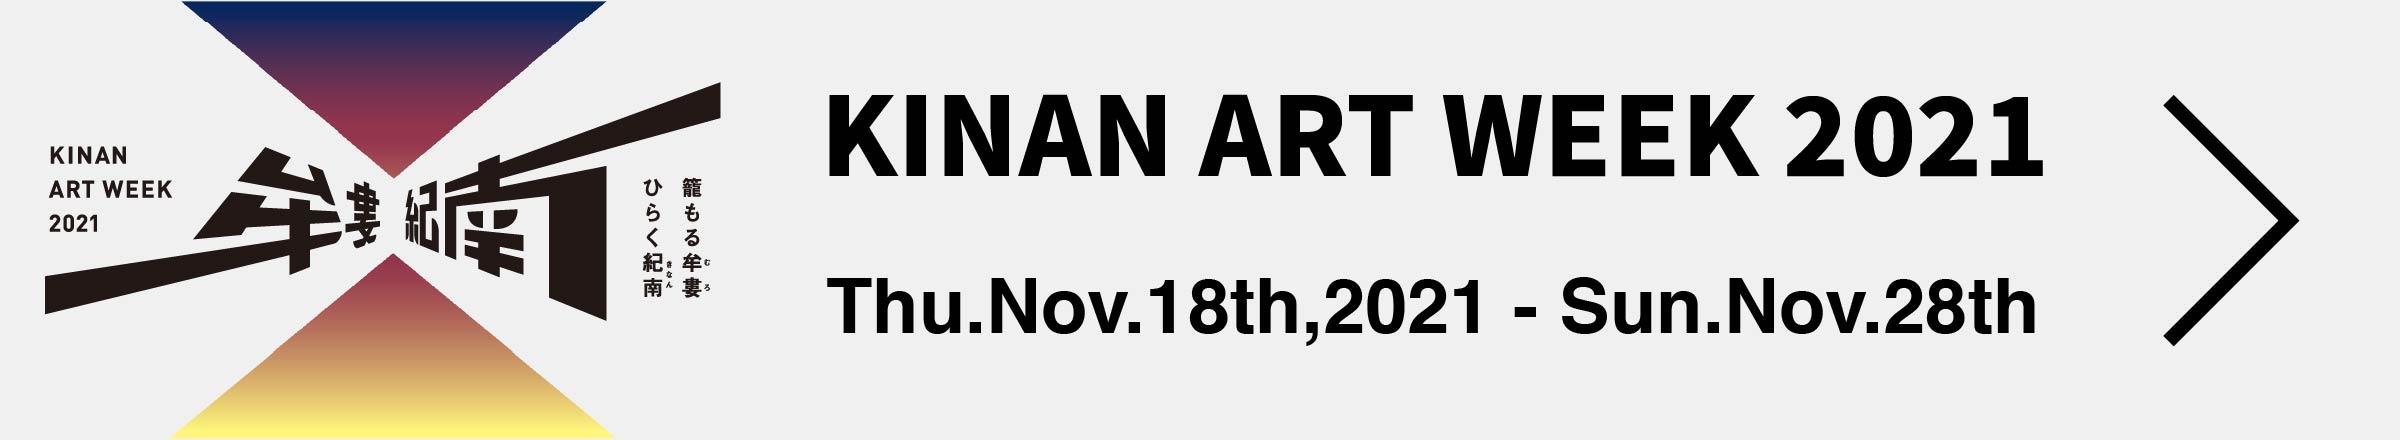 KINAN ART WEEK 2021